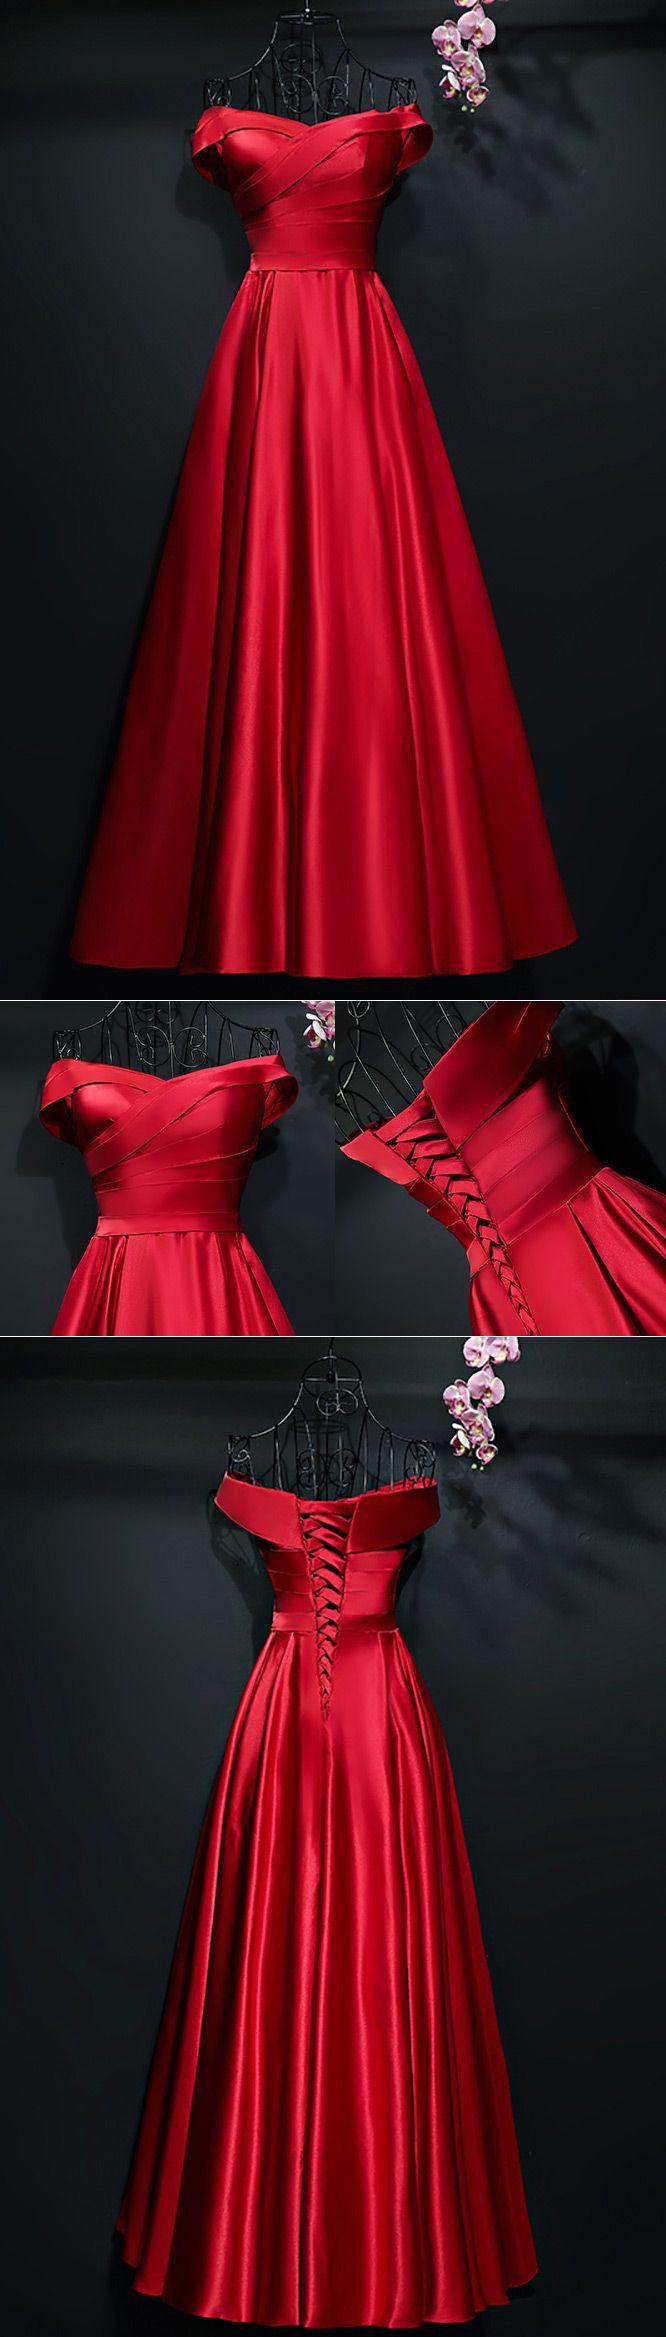 Simple A Line Satin Pleated Off Shoulder Formal Party Dress -  118   MYX18257 - SheProm.com  1f1da5724